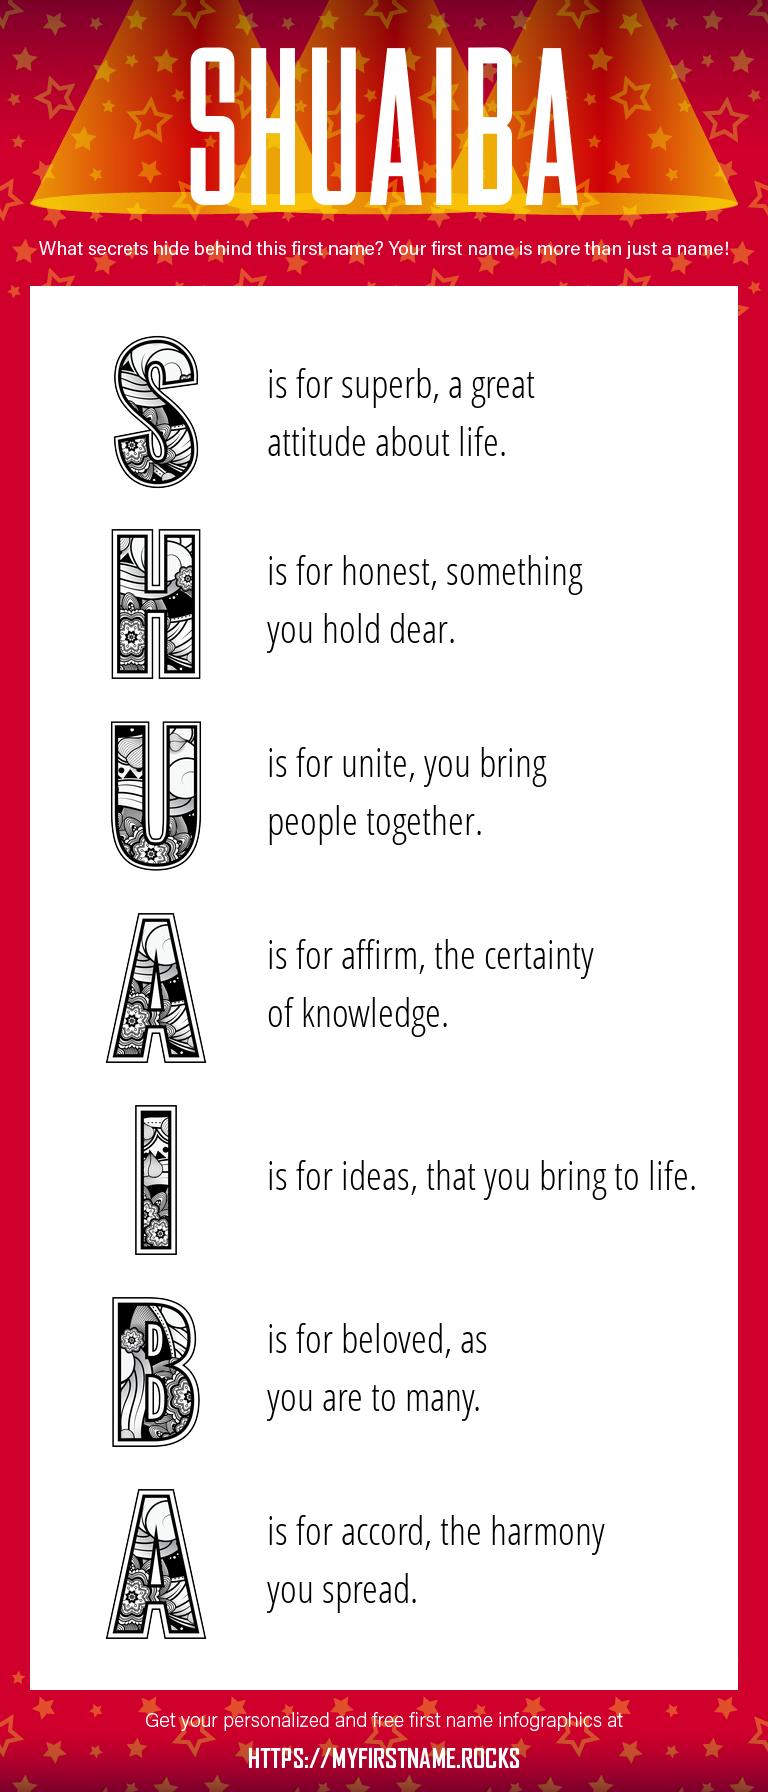 Shuaiba Infographics